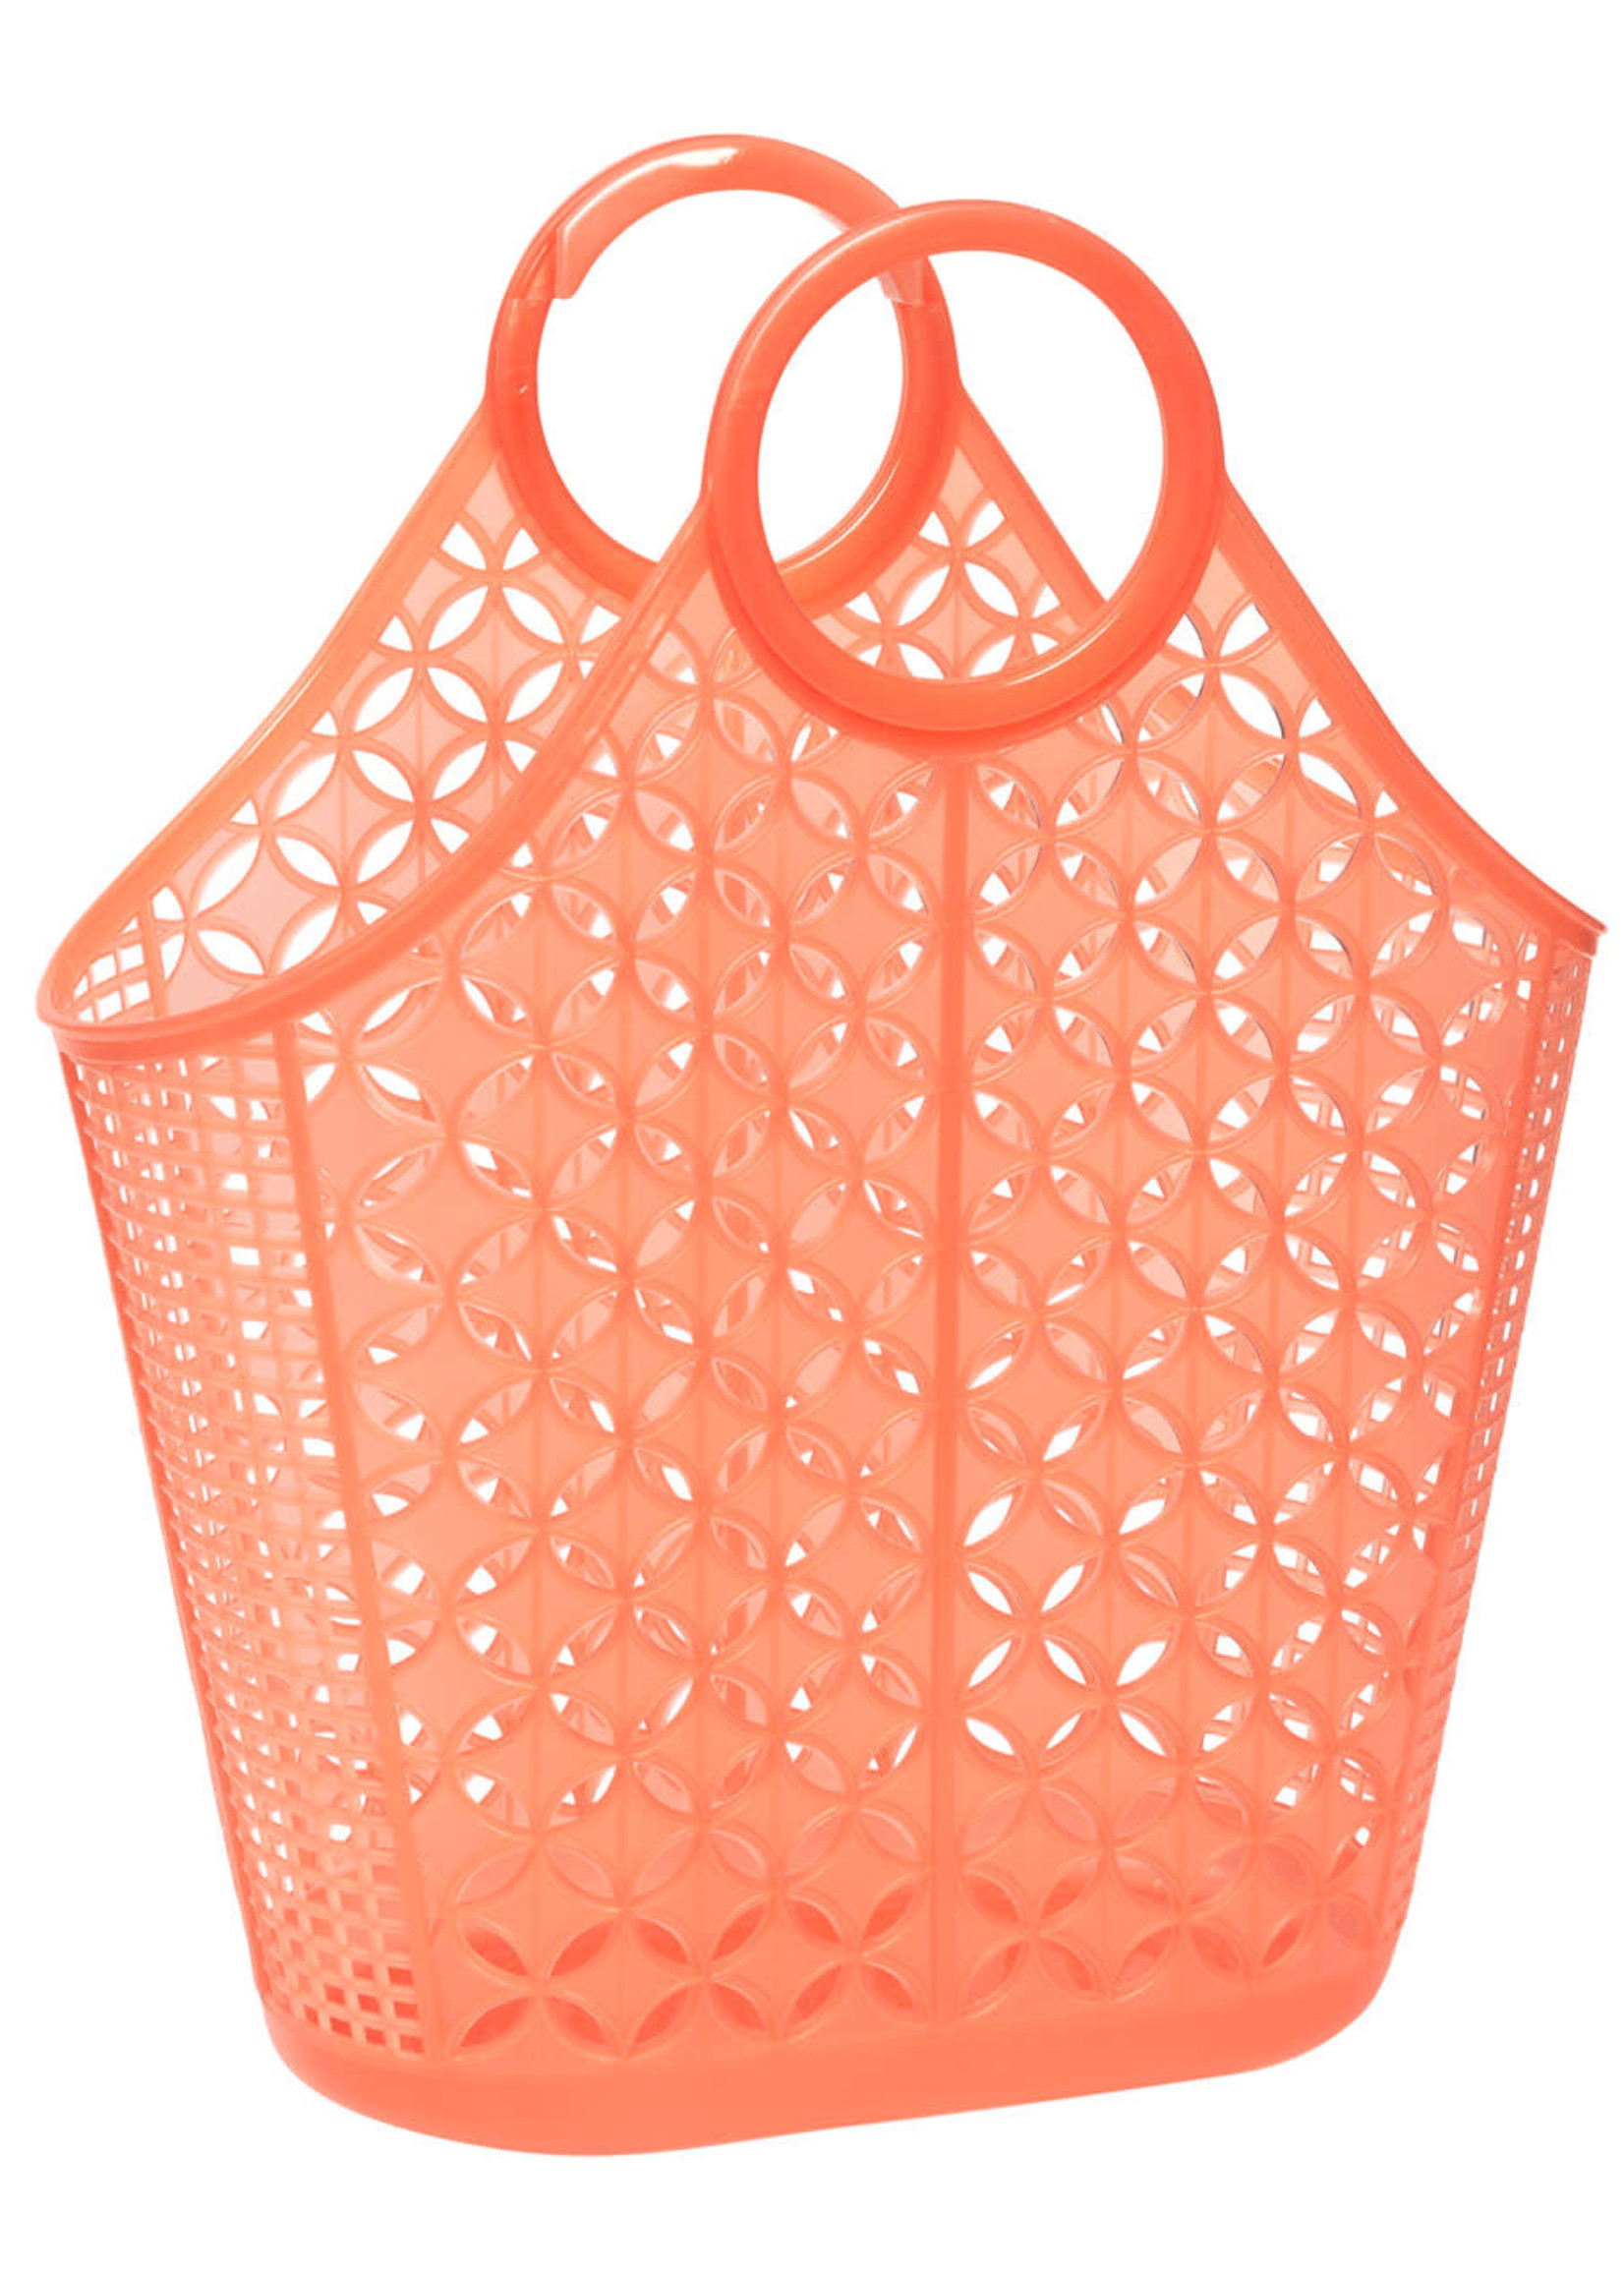 Atomic Tote Neon Orange